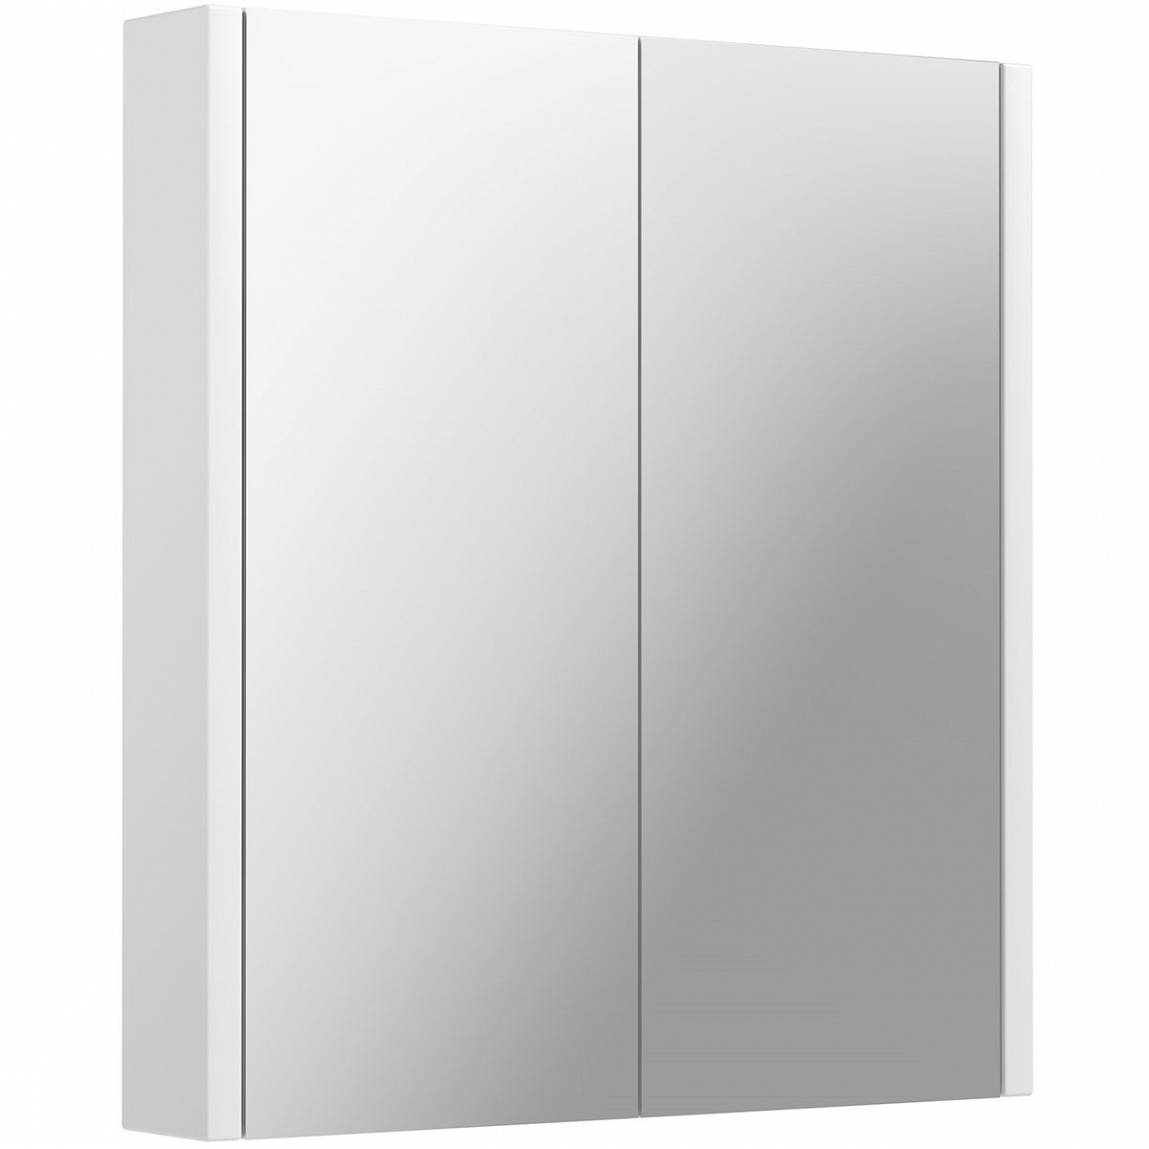 Image of Odessa White 2 Door Mirror Cabinet